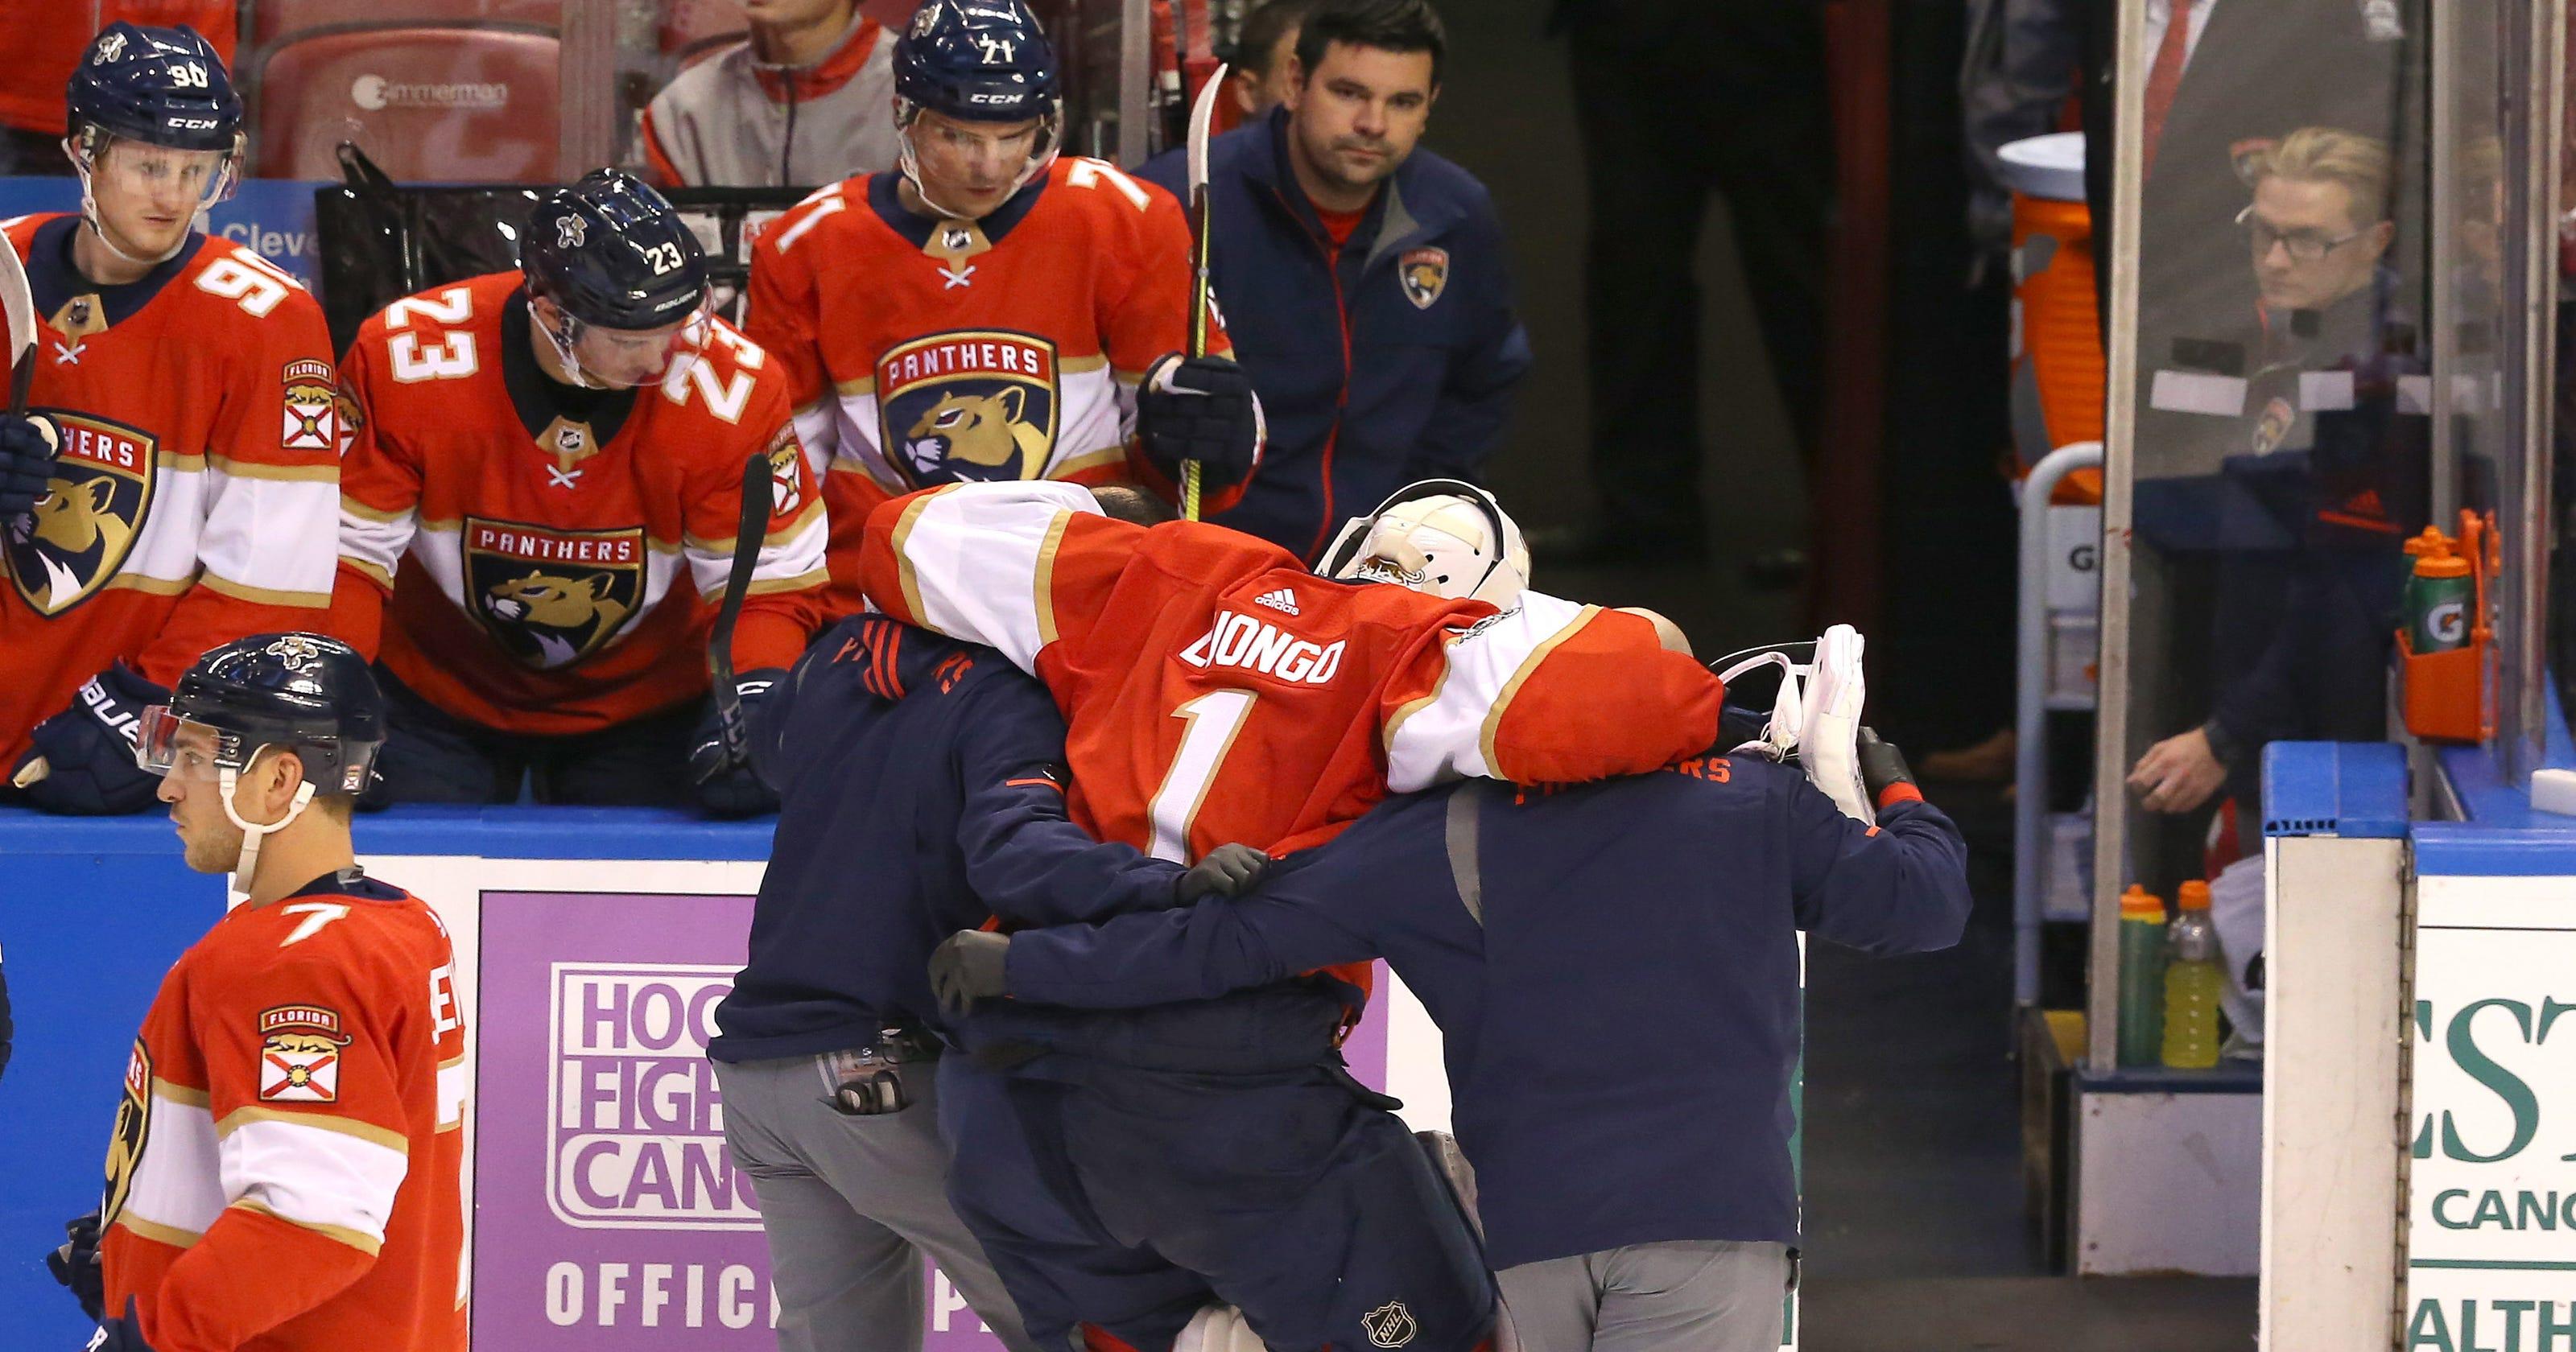 Roberto Luongo Exits Florida Panthers Game With Apparent Leg Injury